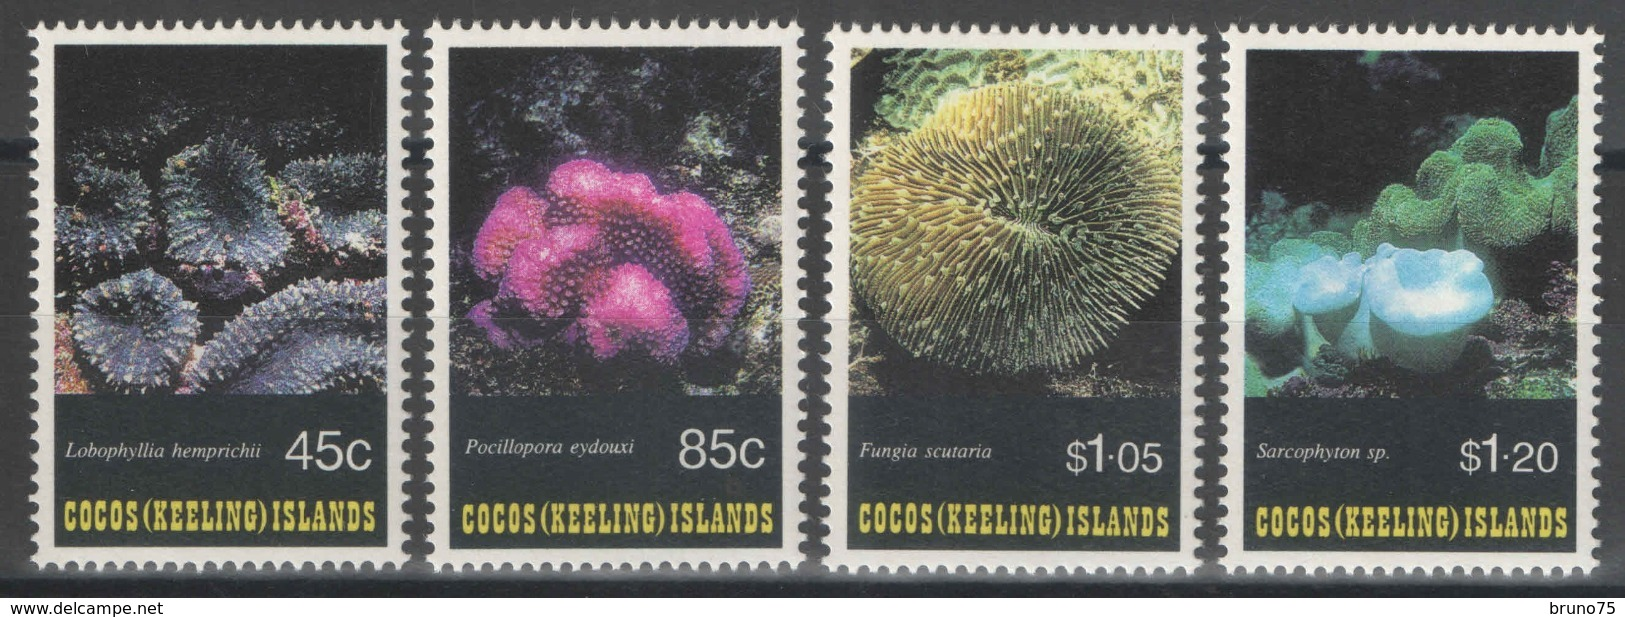 Cocos (Keeling) Islands - YT 267-270 ** MNH - 1993 - Faune Marine - Coraux - Cocos (Keeling) Islands